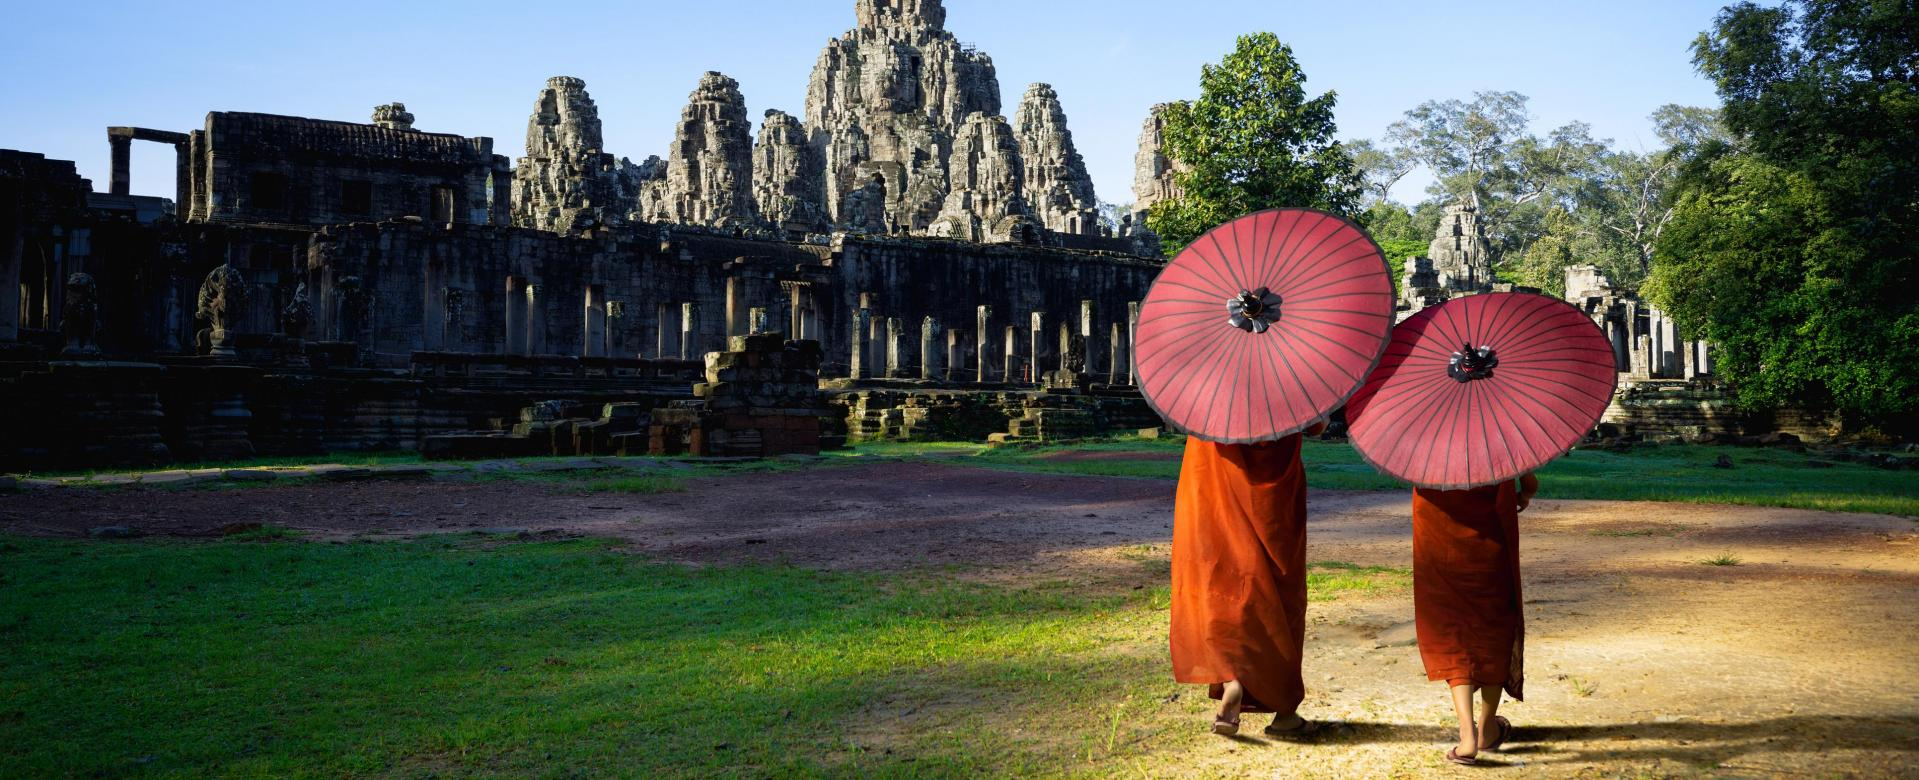 Voyage à pied Cambodge : Angkor et fleuve mékong